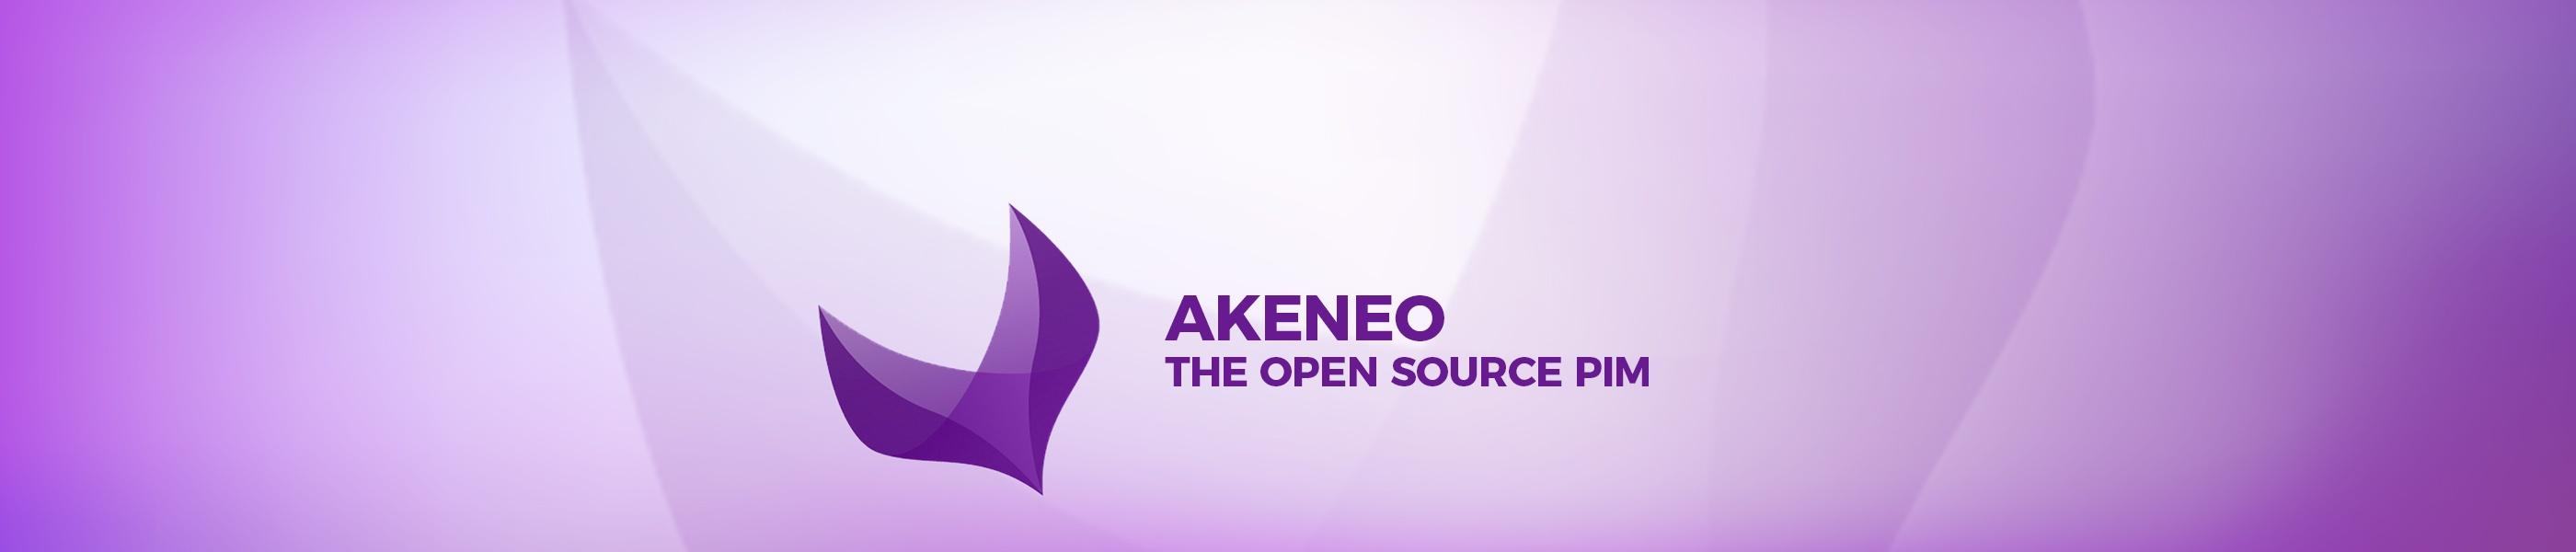 180108_Produkte_akeneo.jpg